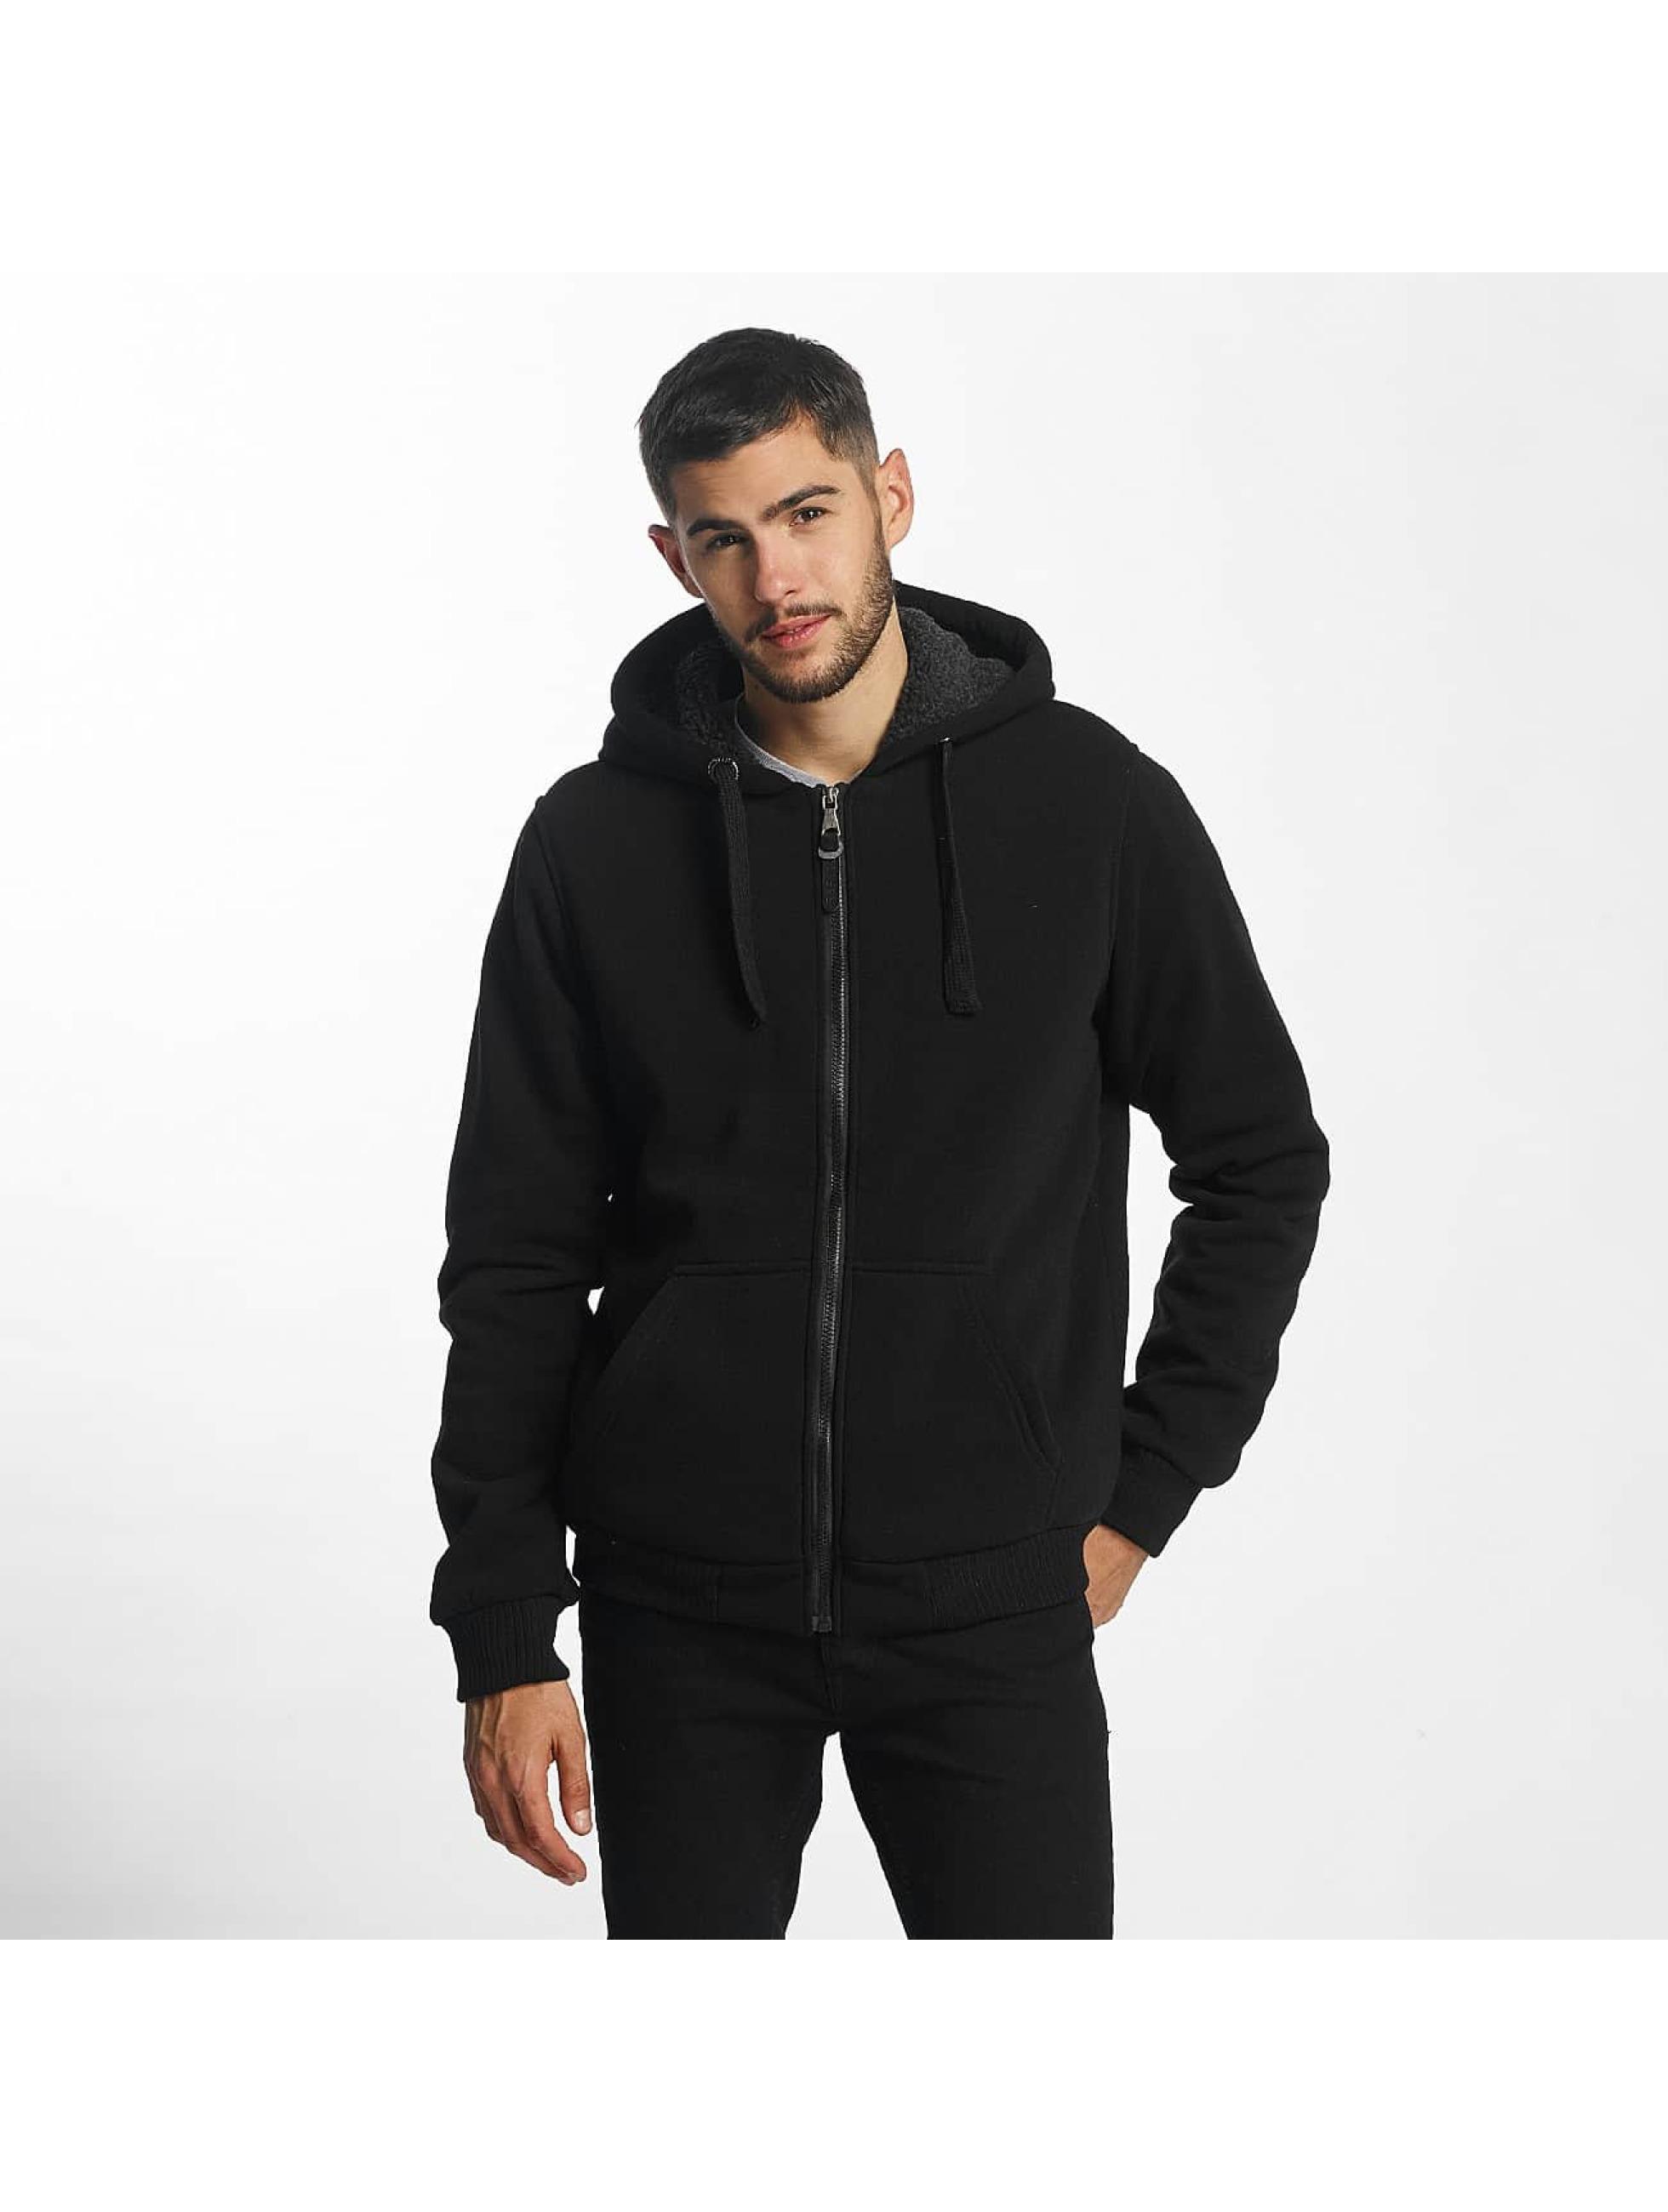 Brave Soul Hoodies con zip Sherpa Lined nero